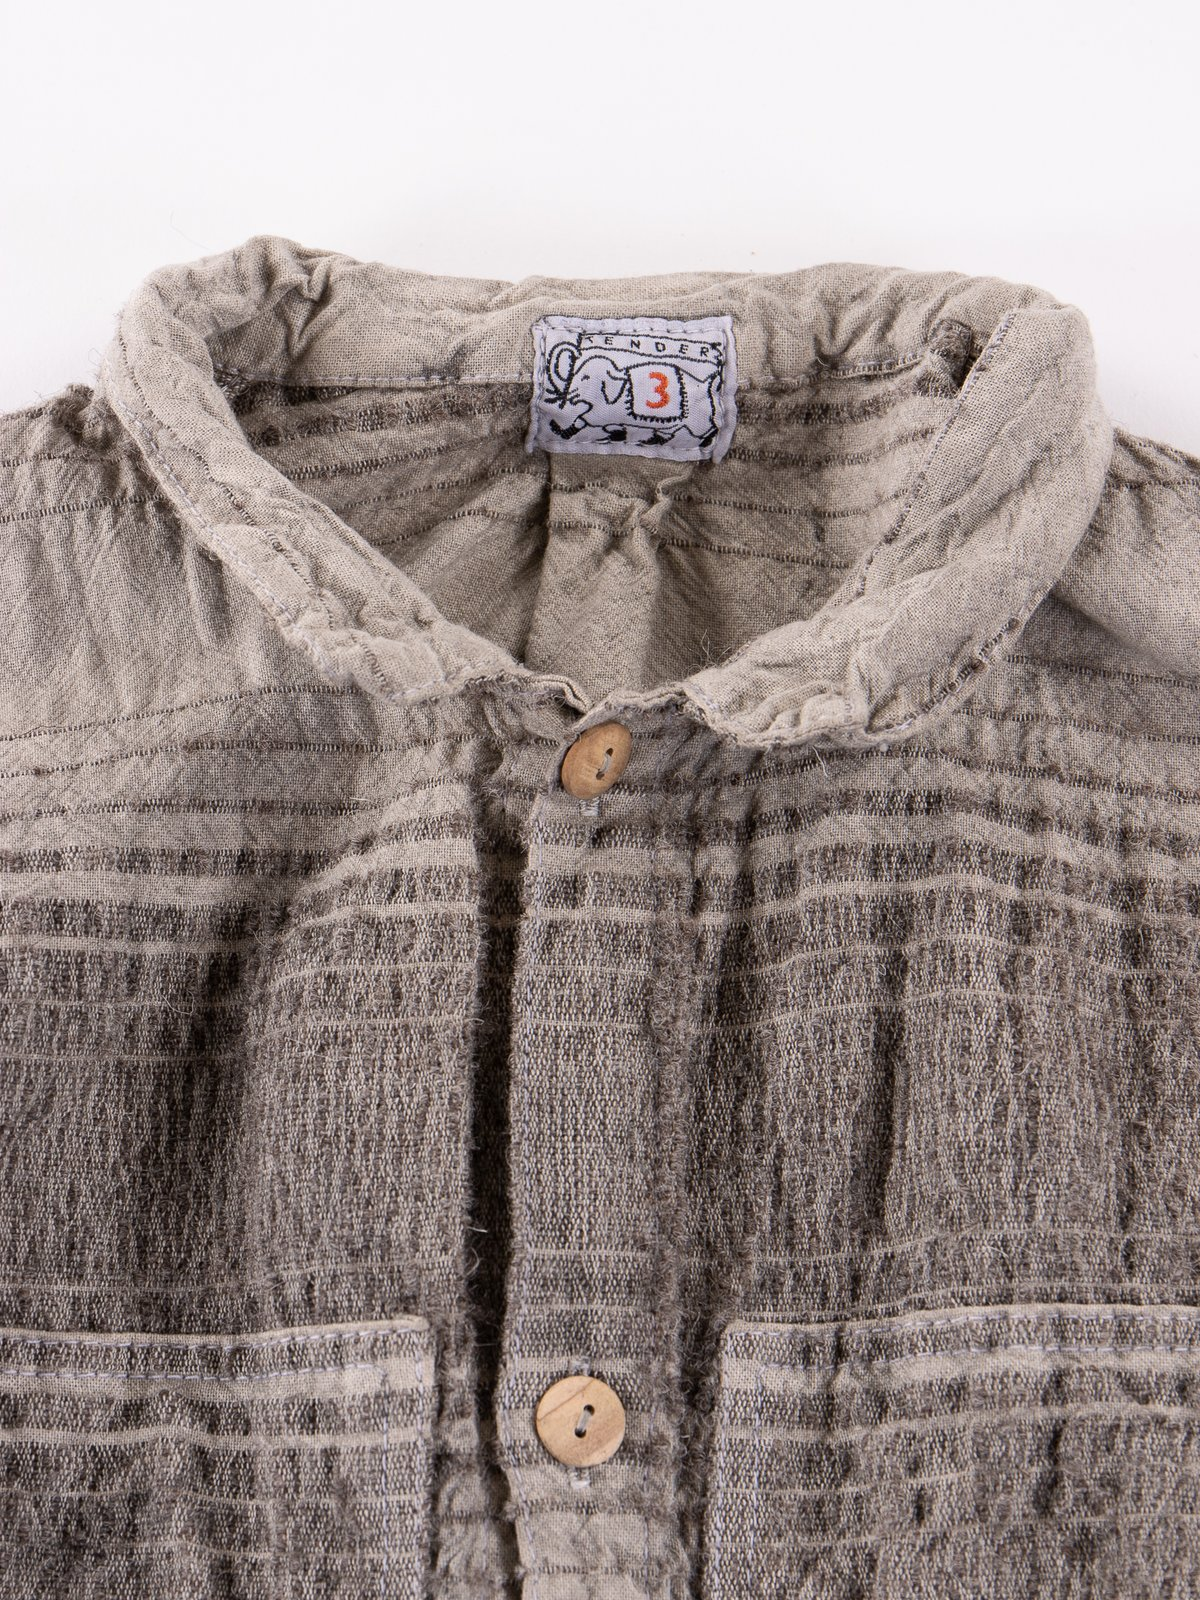 Indian Black Dye Doppler Stripe Calico Periscope Pocket Tail Shirt - Image 4